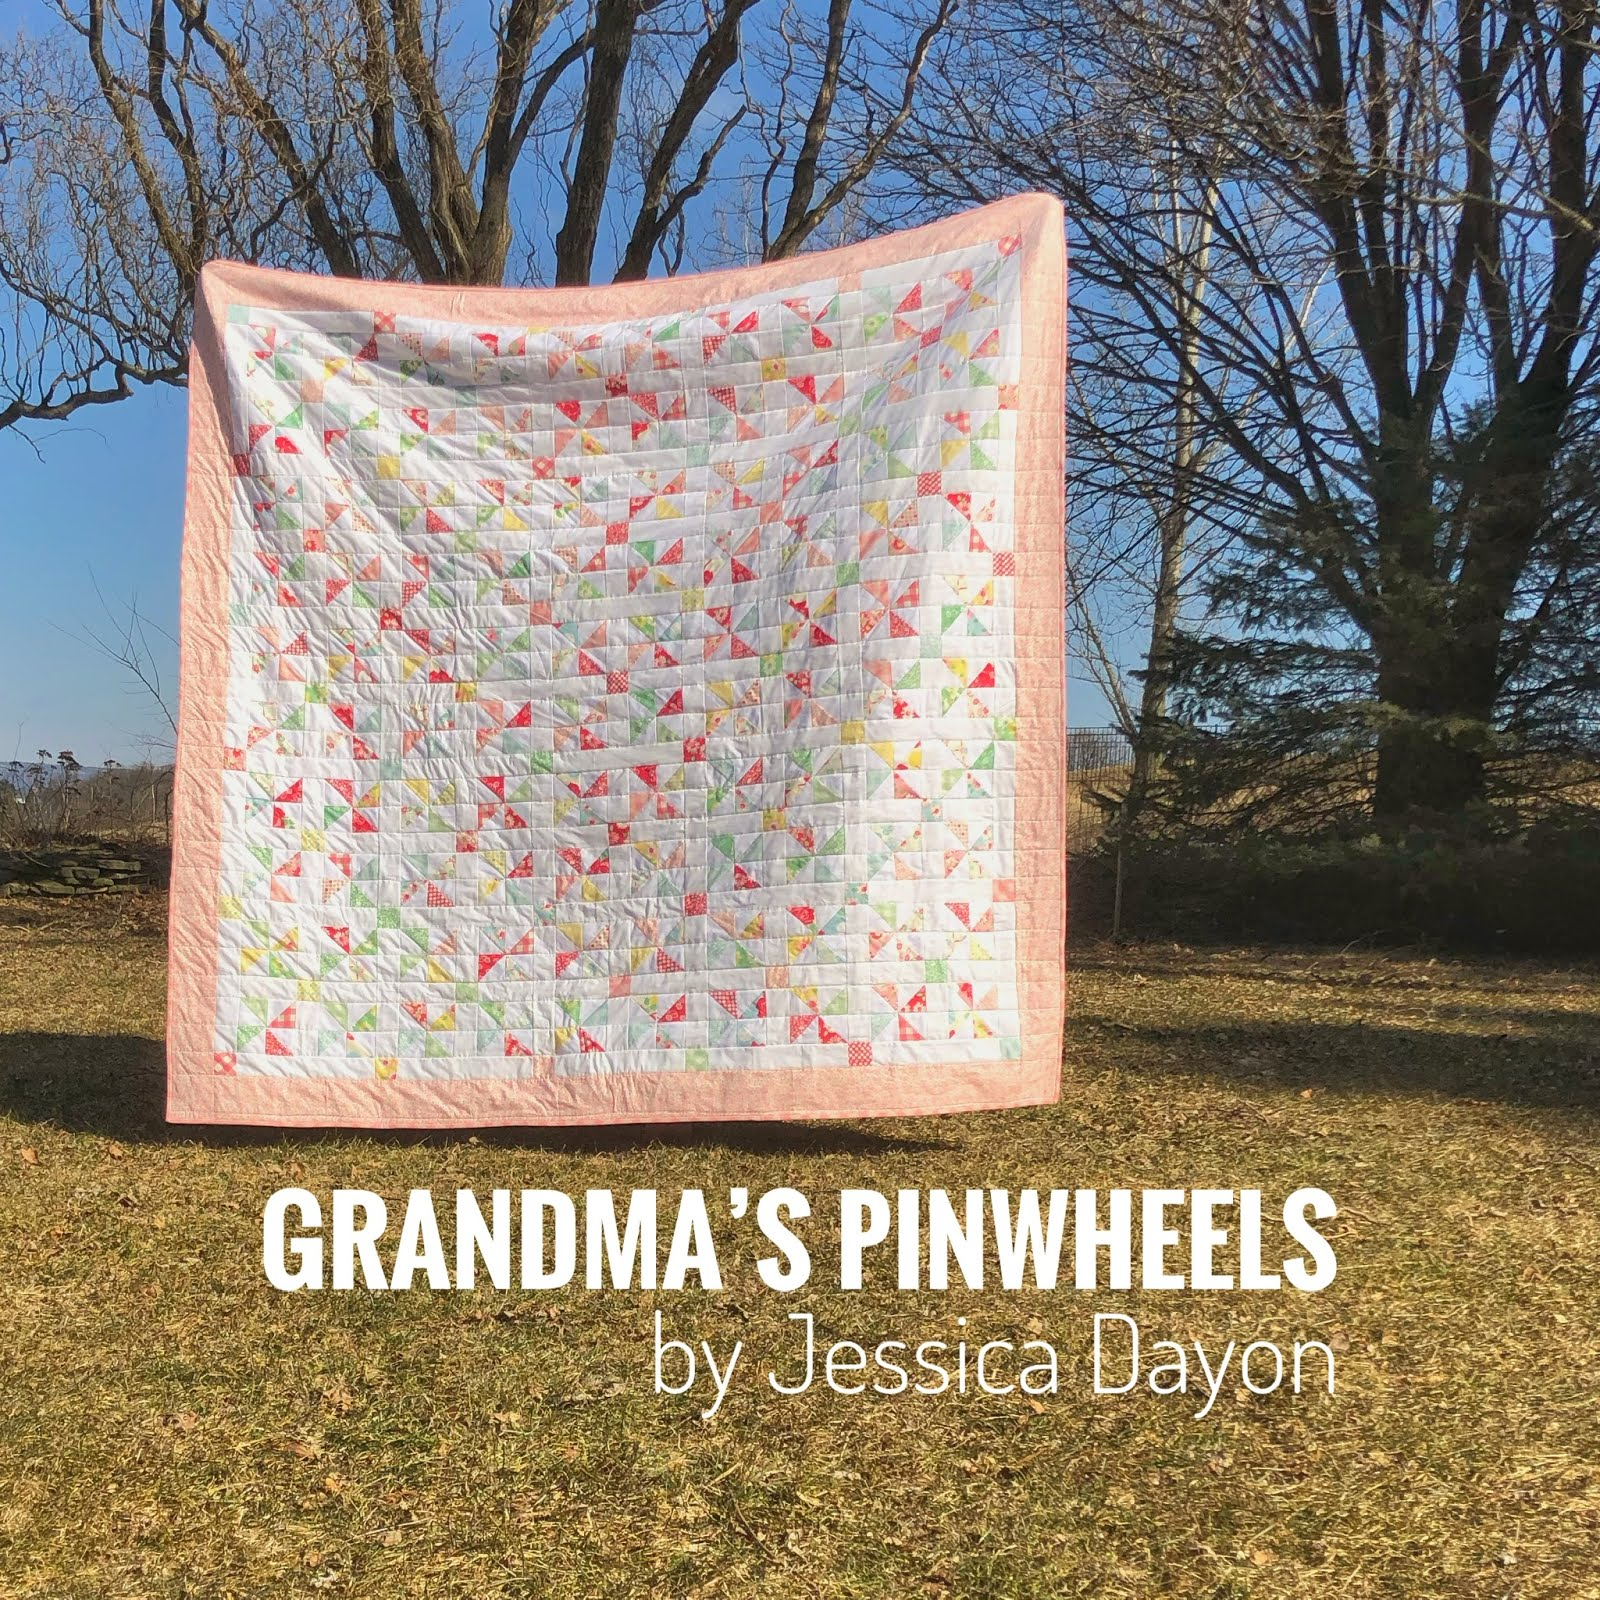 Grandma's Pinwheel